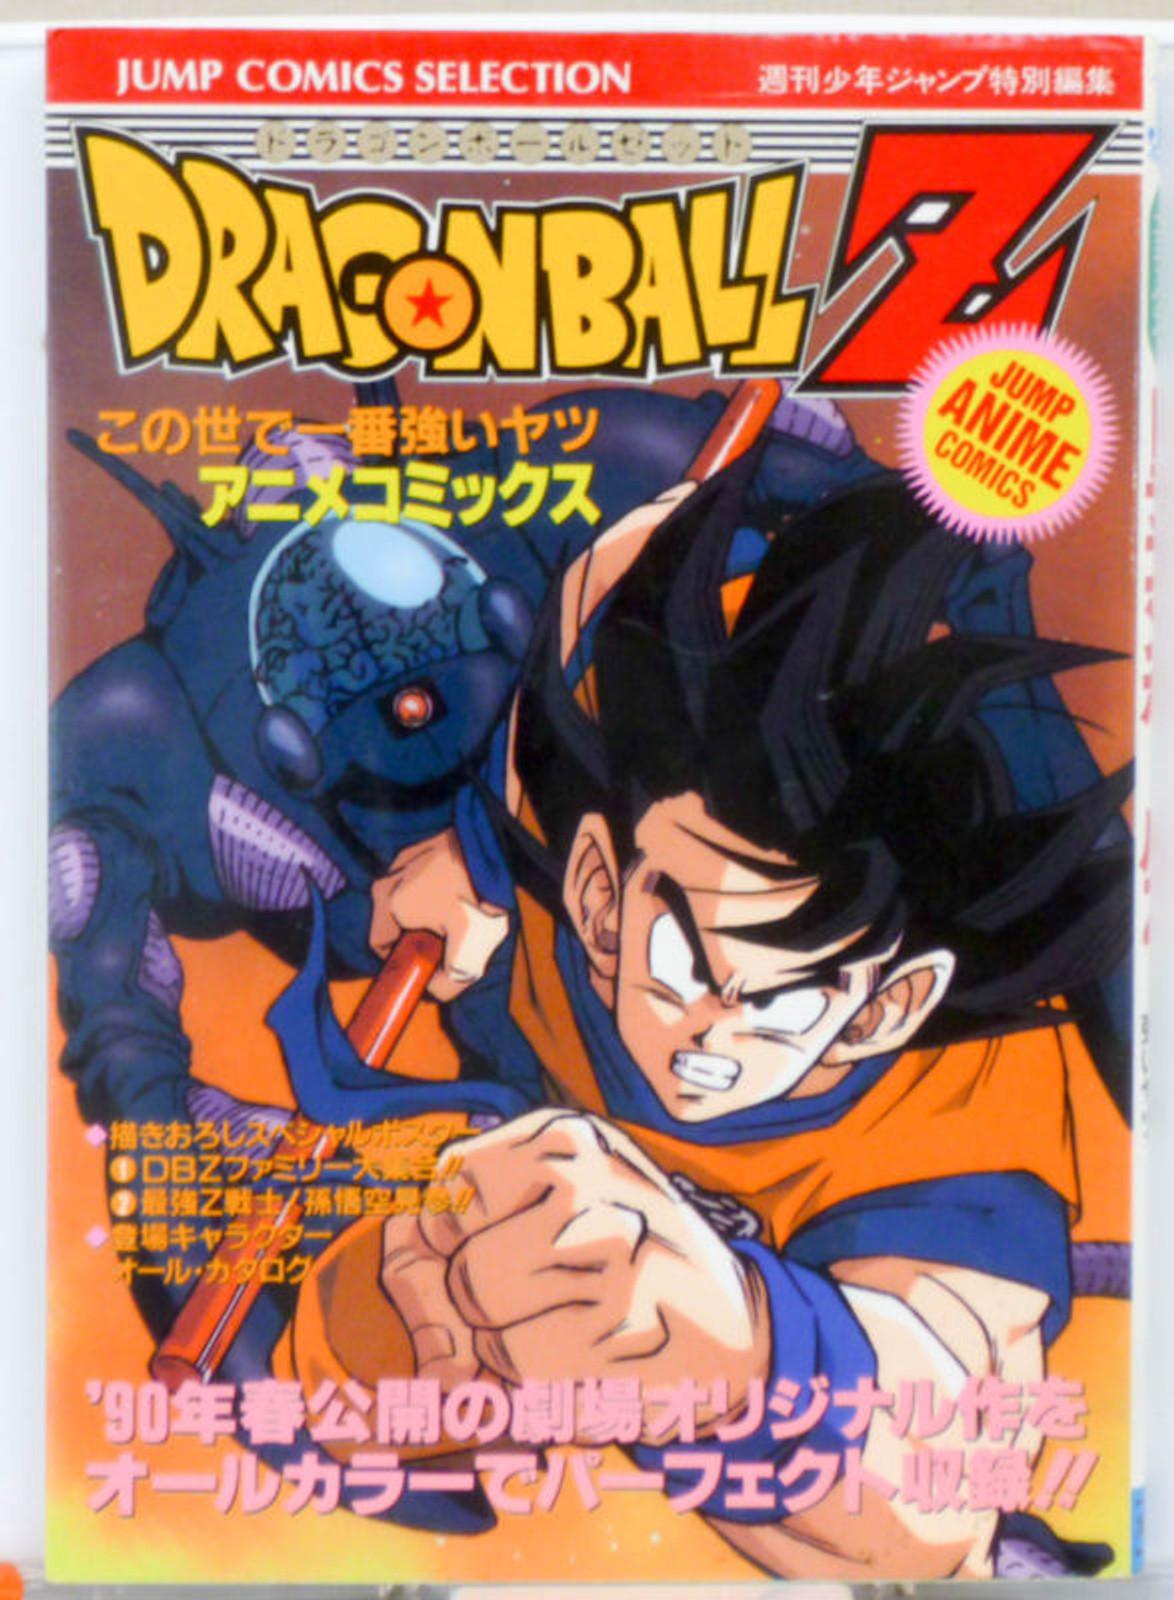 Dragon Ball Z Anime Movie Film Comics Book JAPAN ANIME MANGA 11